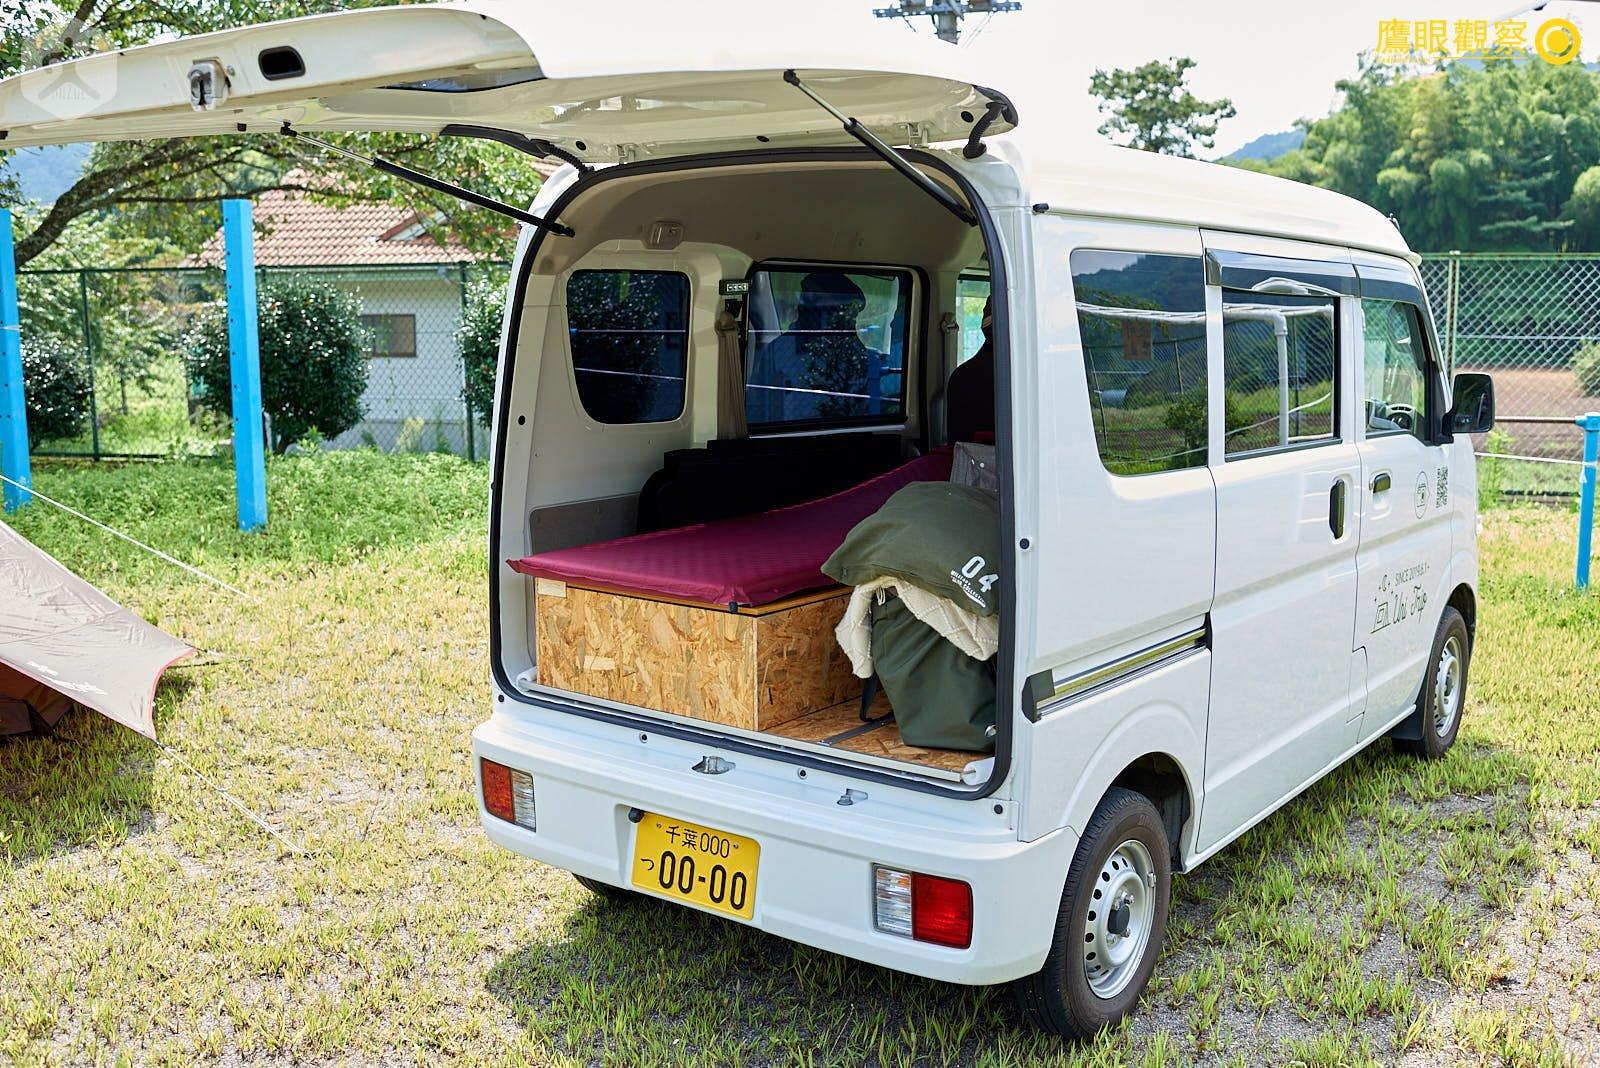 Japan Travel RV Camper School 20190817105304 日本廢棄小學 🚗 RV 休旅車露營、森林探險之旅(櫪木縣鹿沼市立久我小學)🇯🇵⛺️